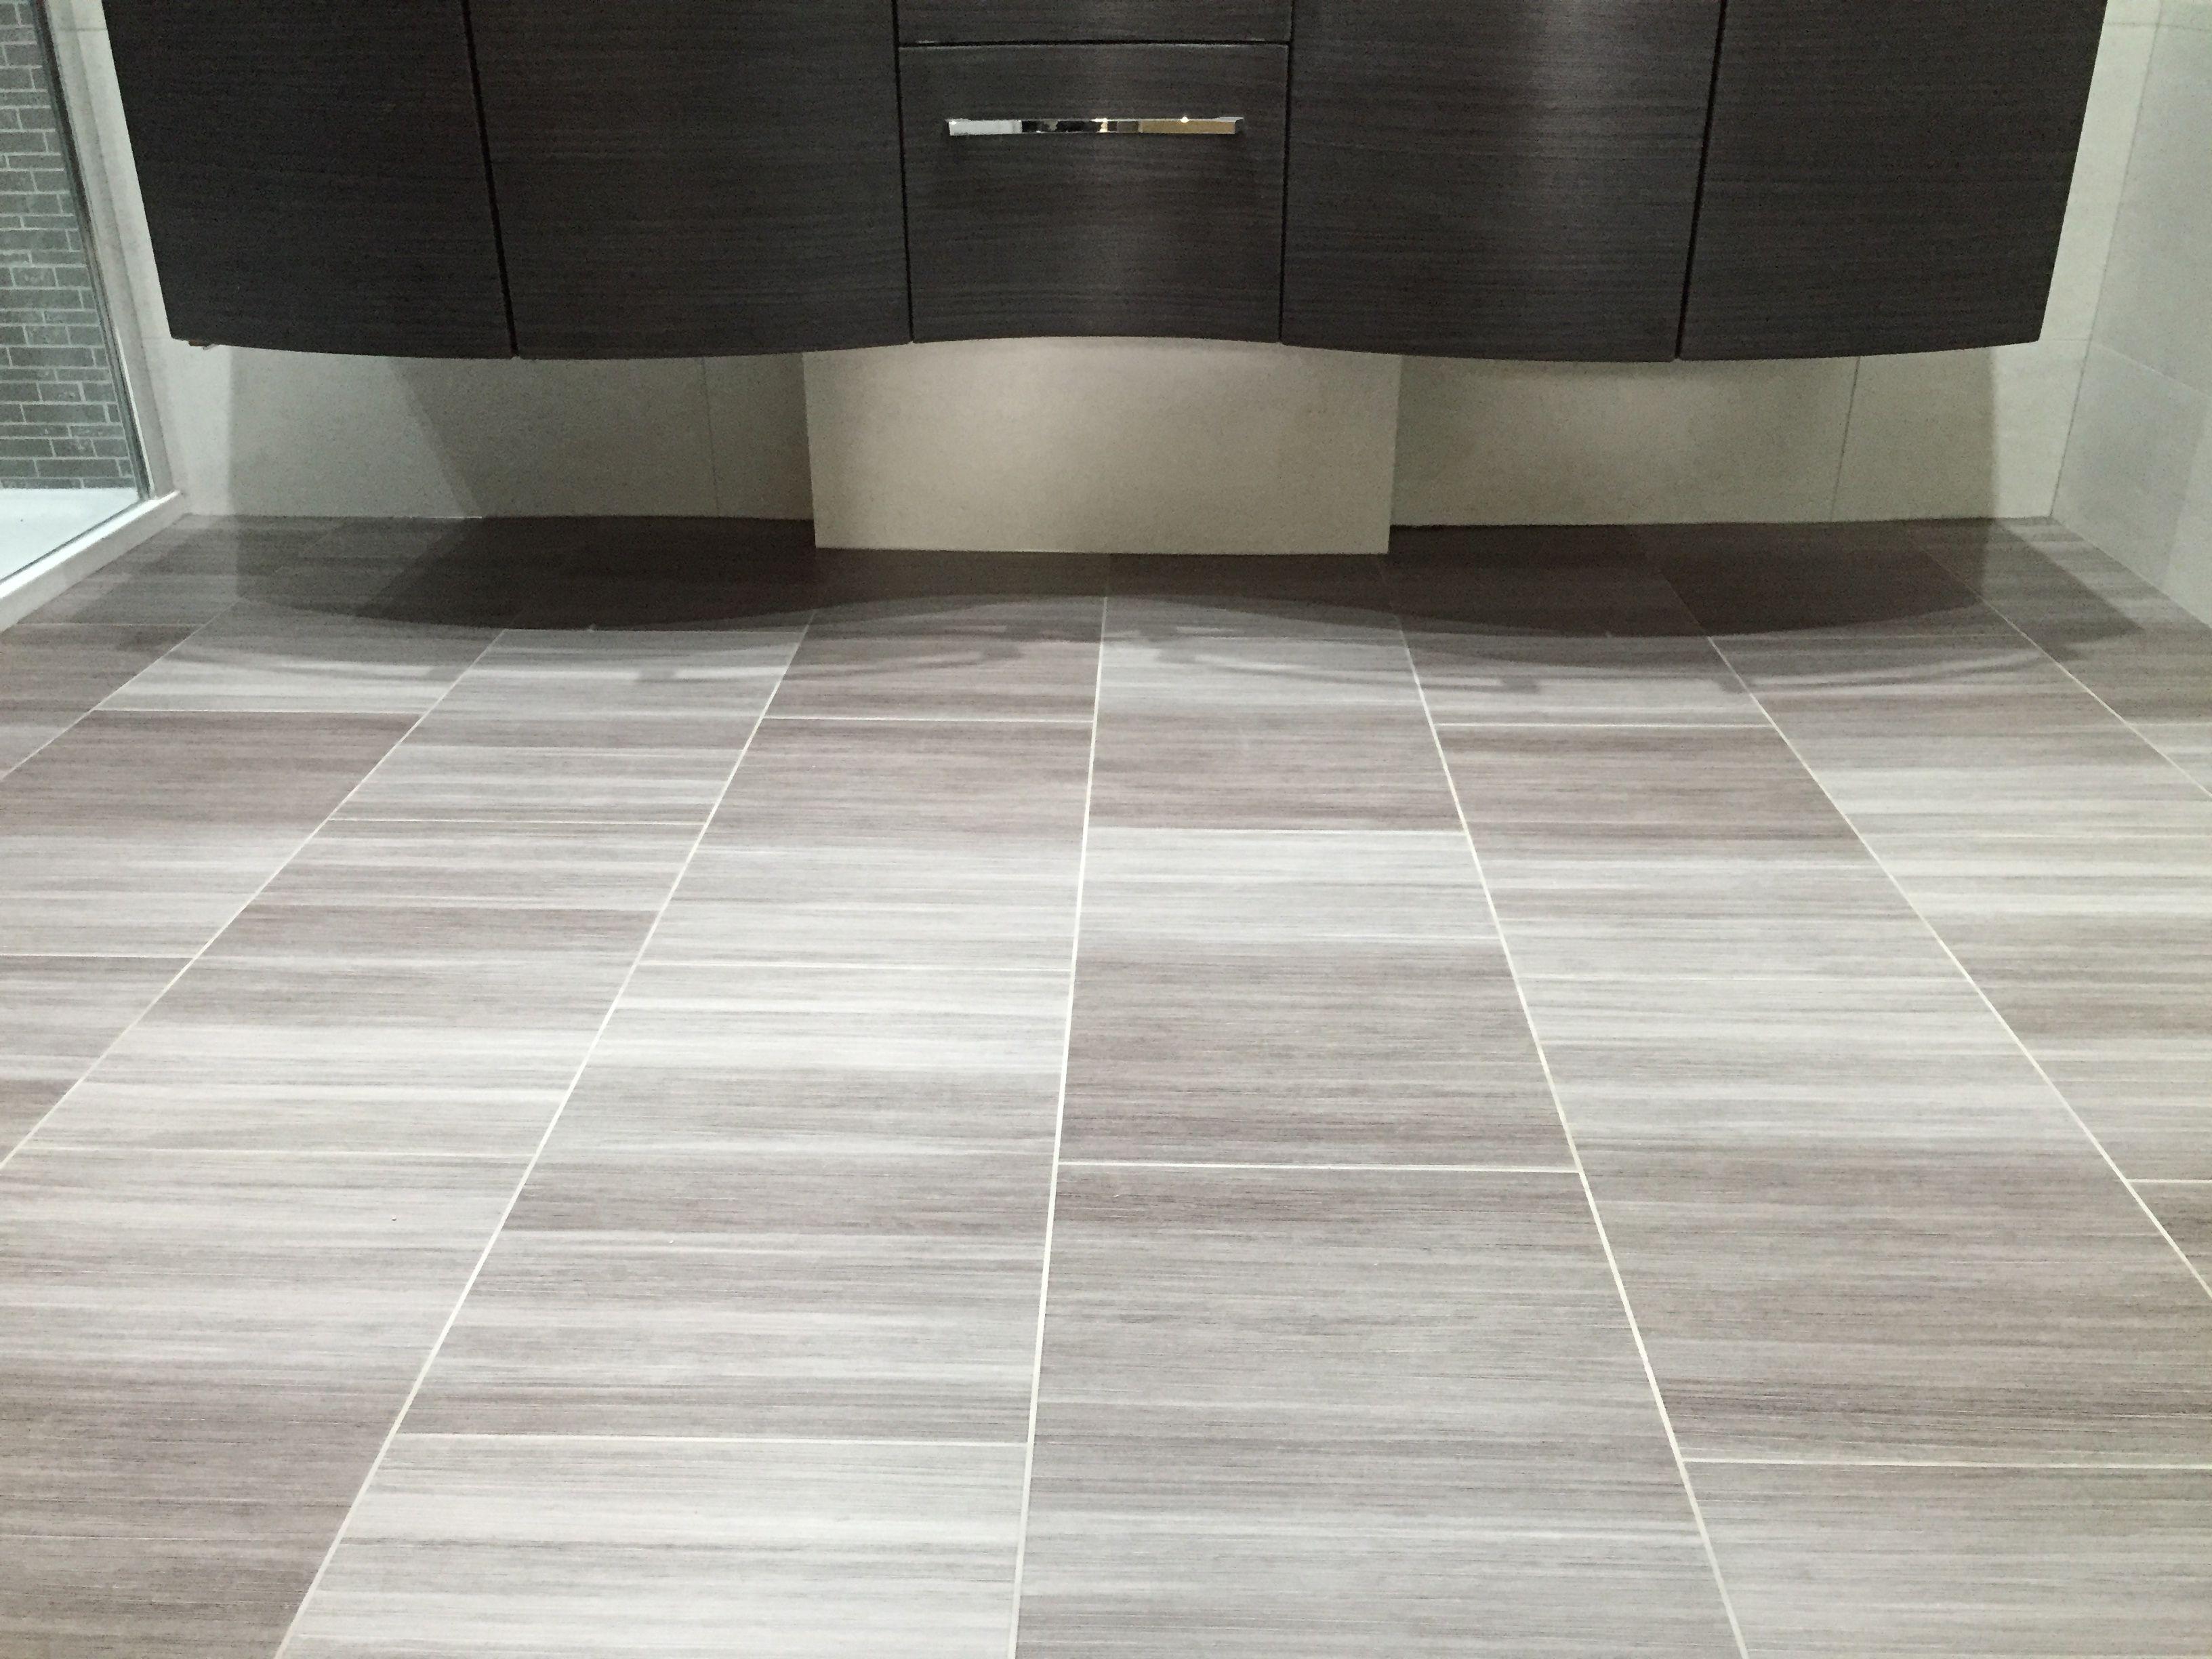 amtico flooring for bathrooms - Google Search | Amtico ...